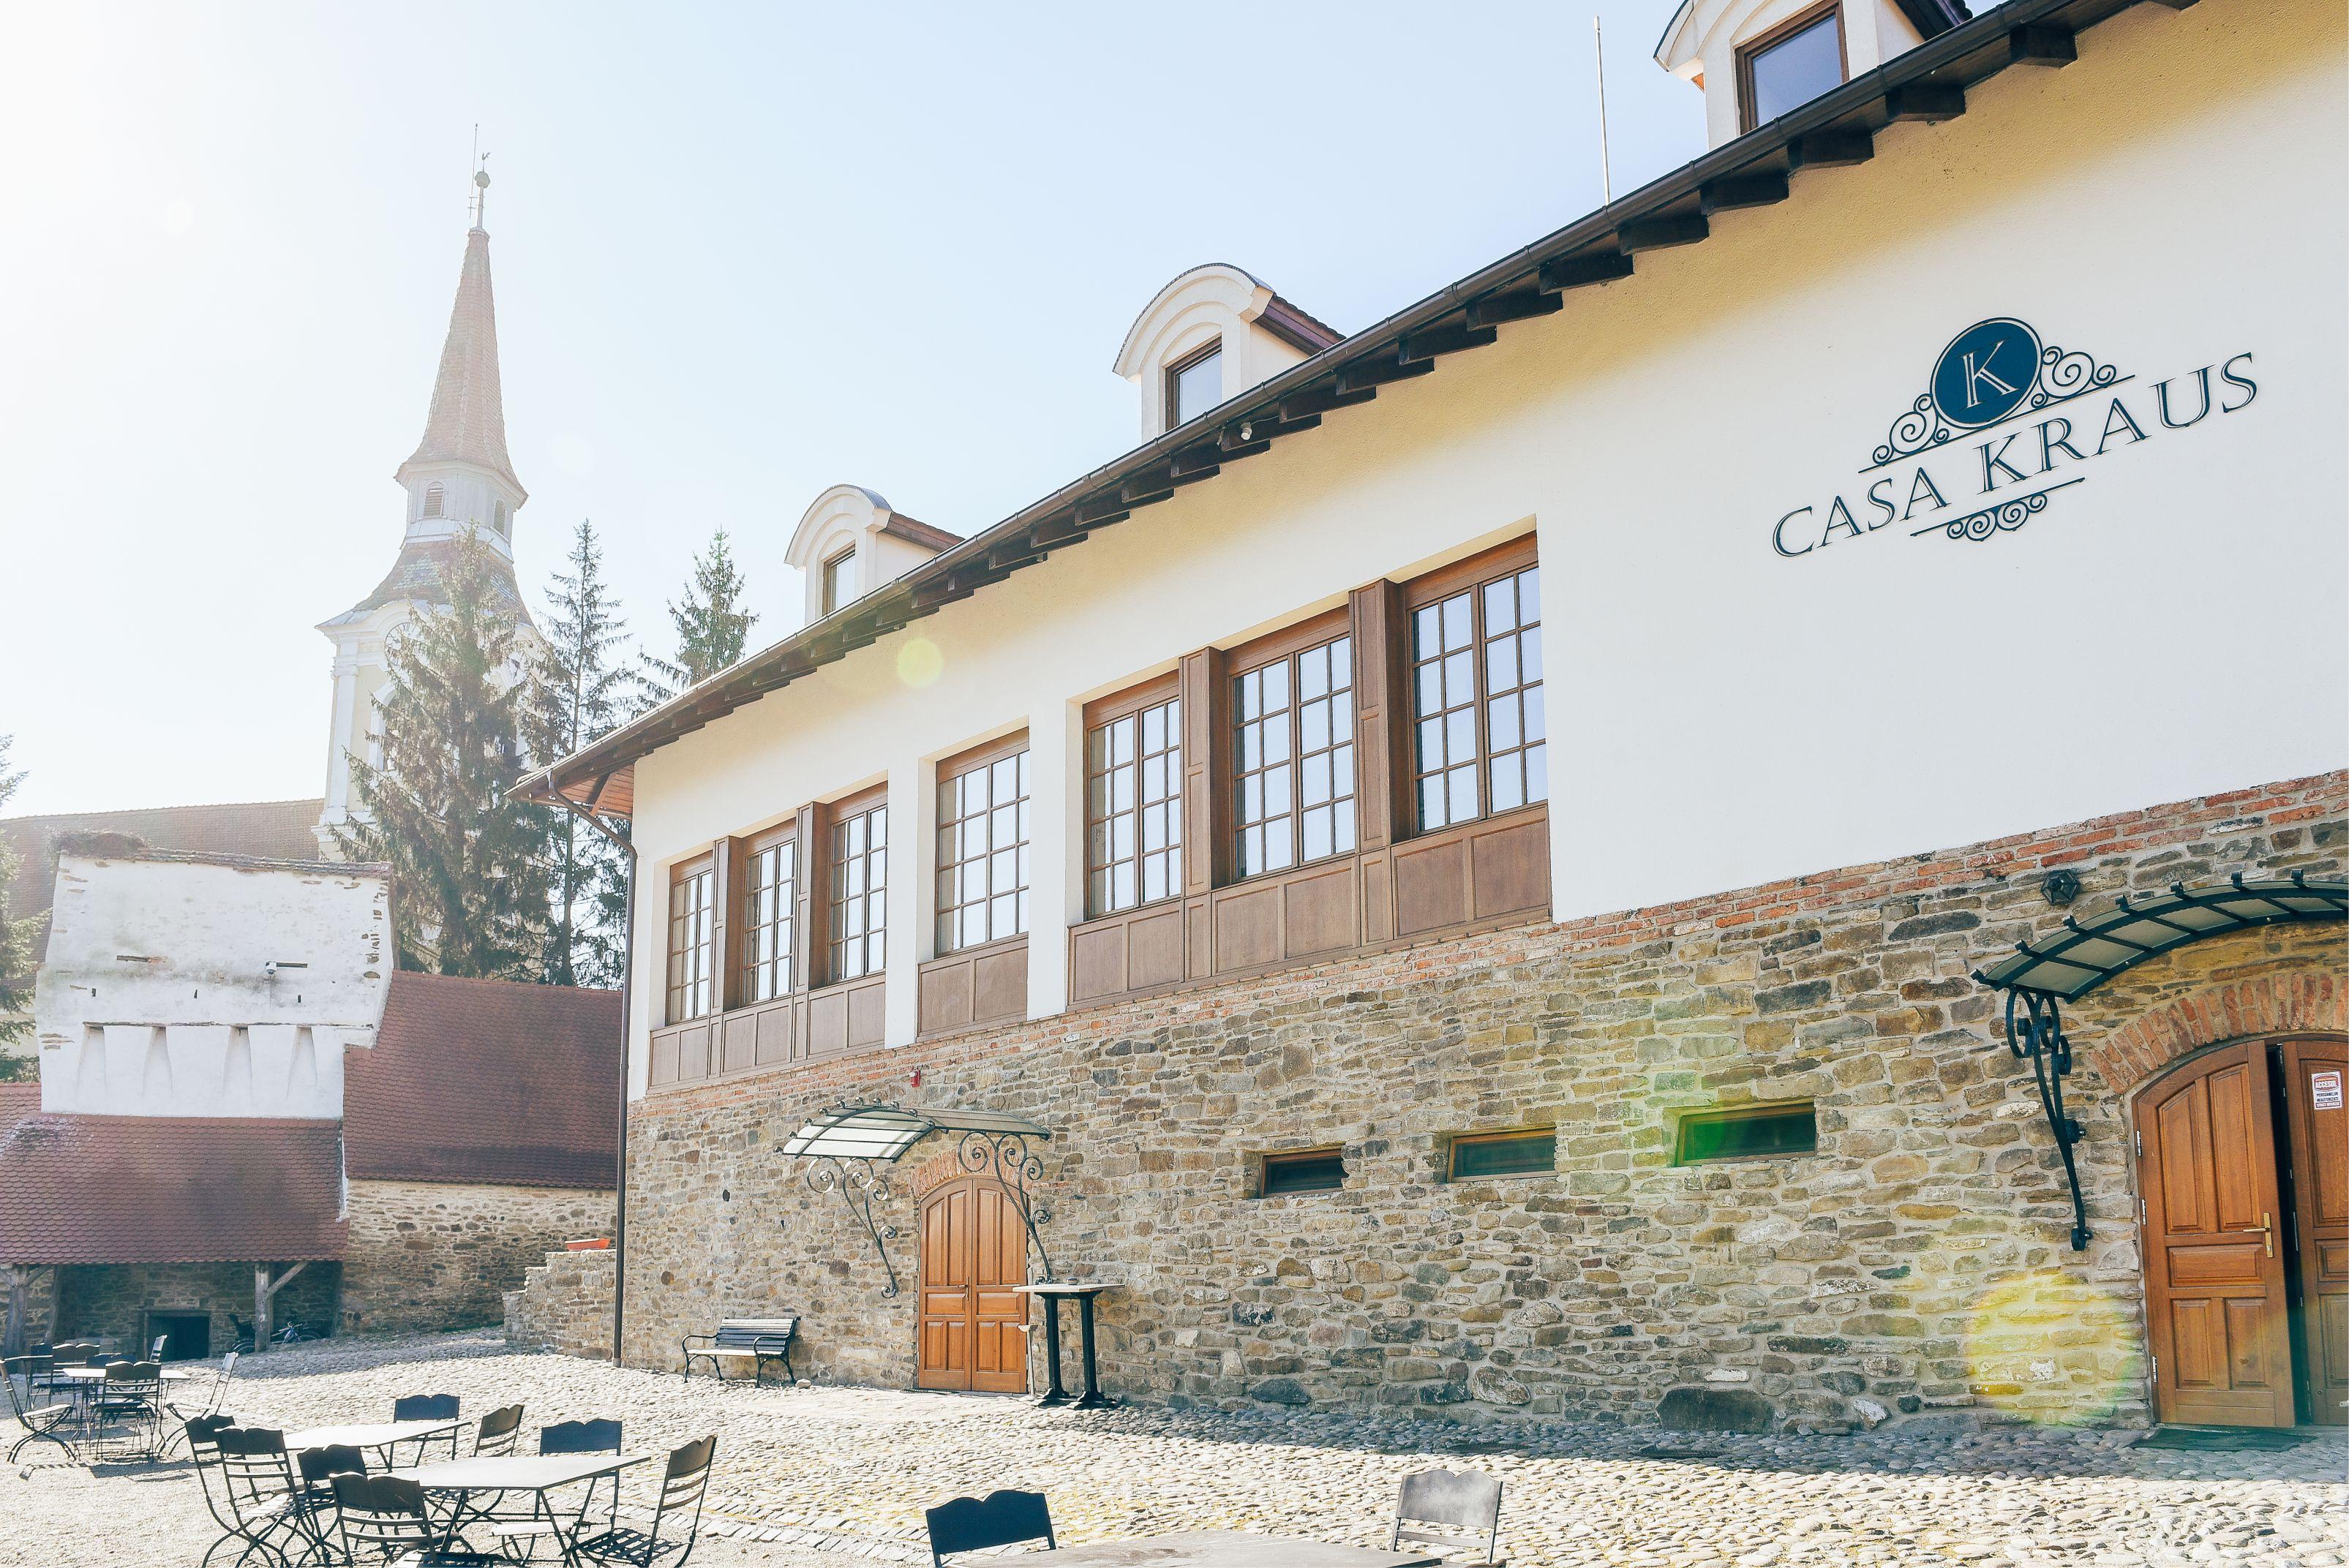 website_istoria-casei-kraus